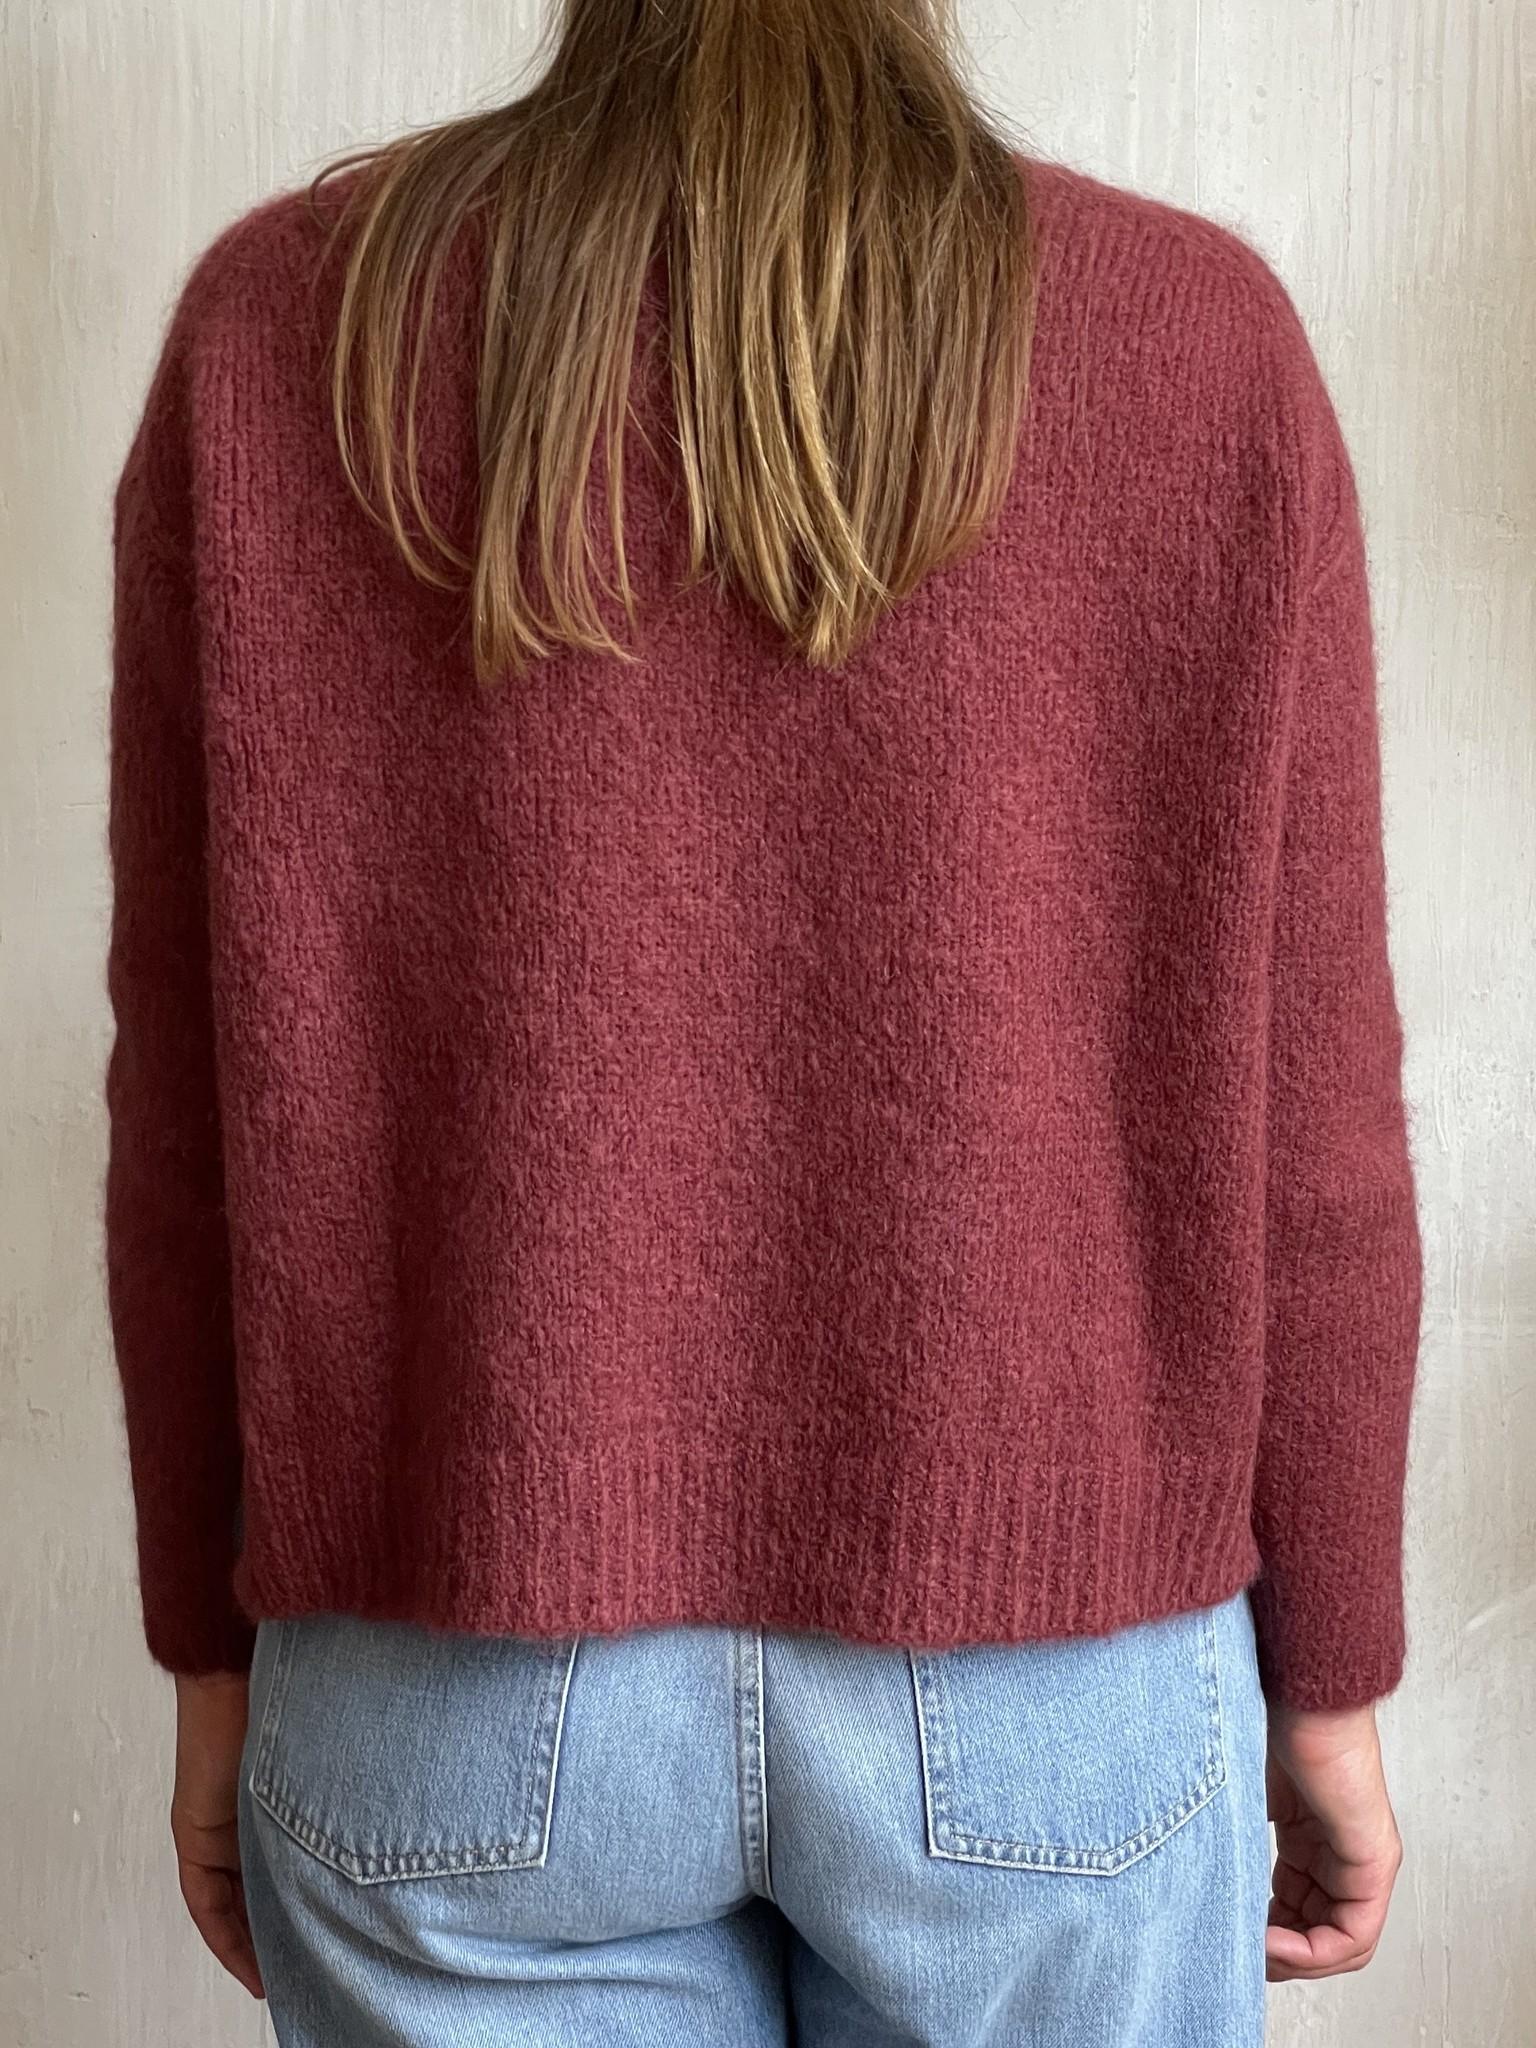 knit 8299 aubergine-4